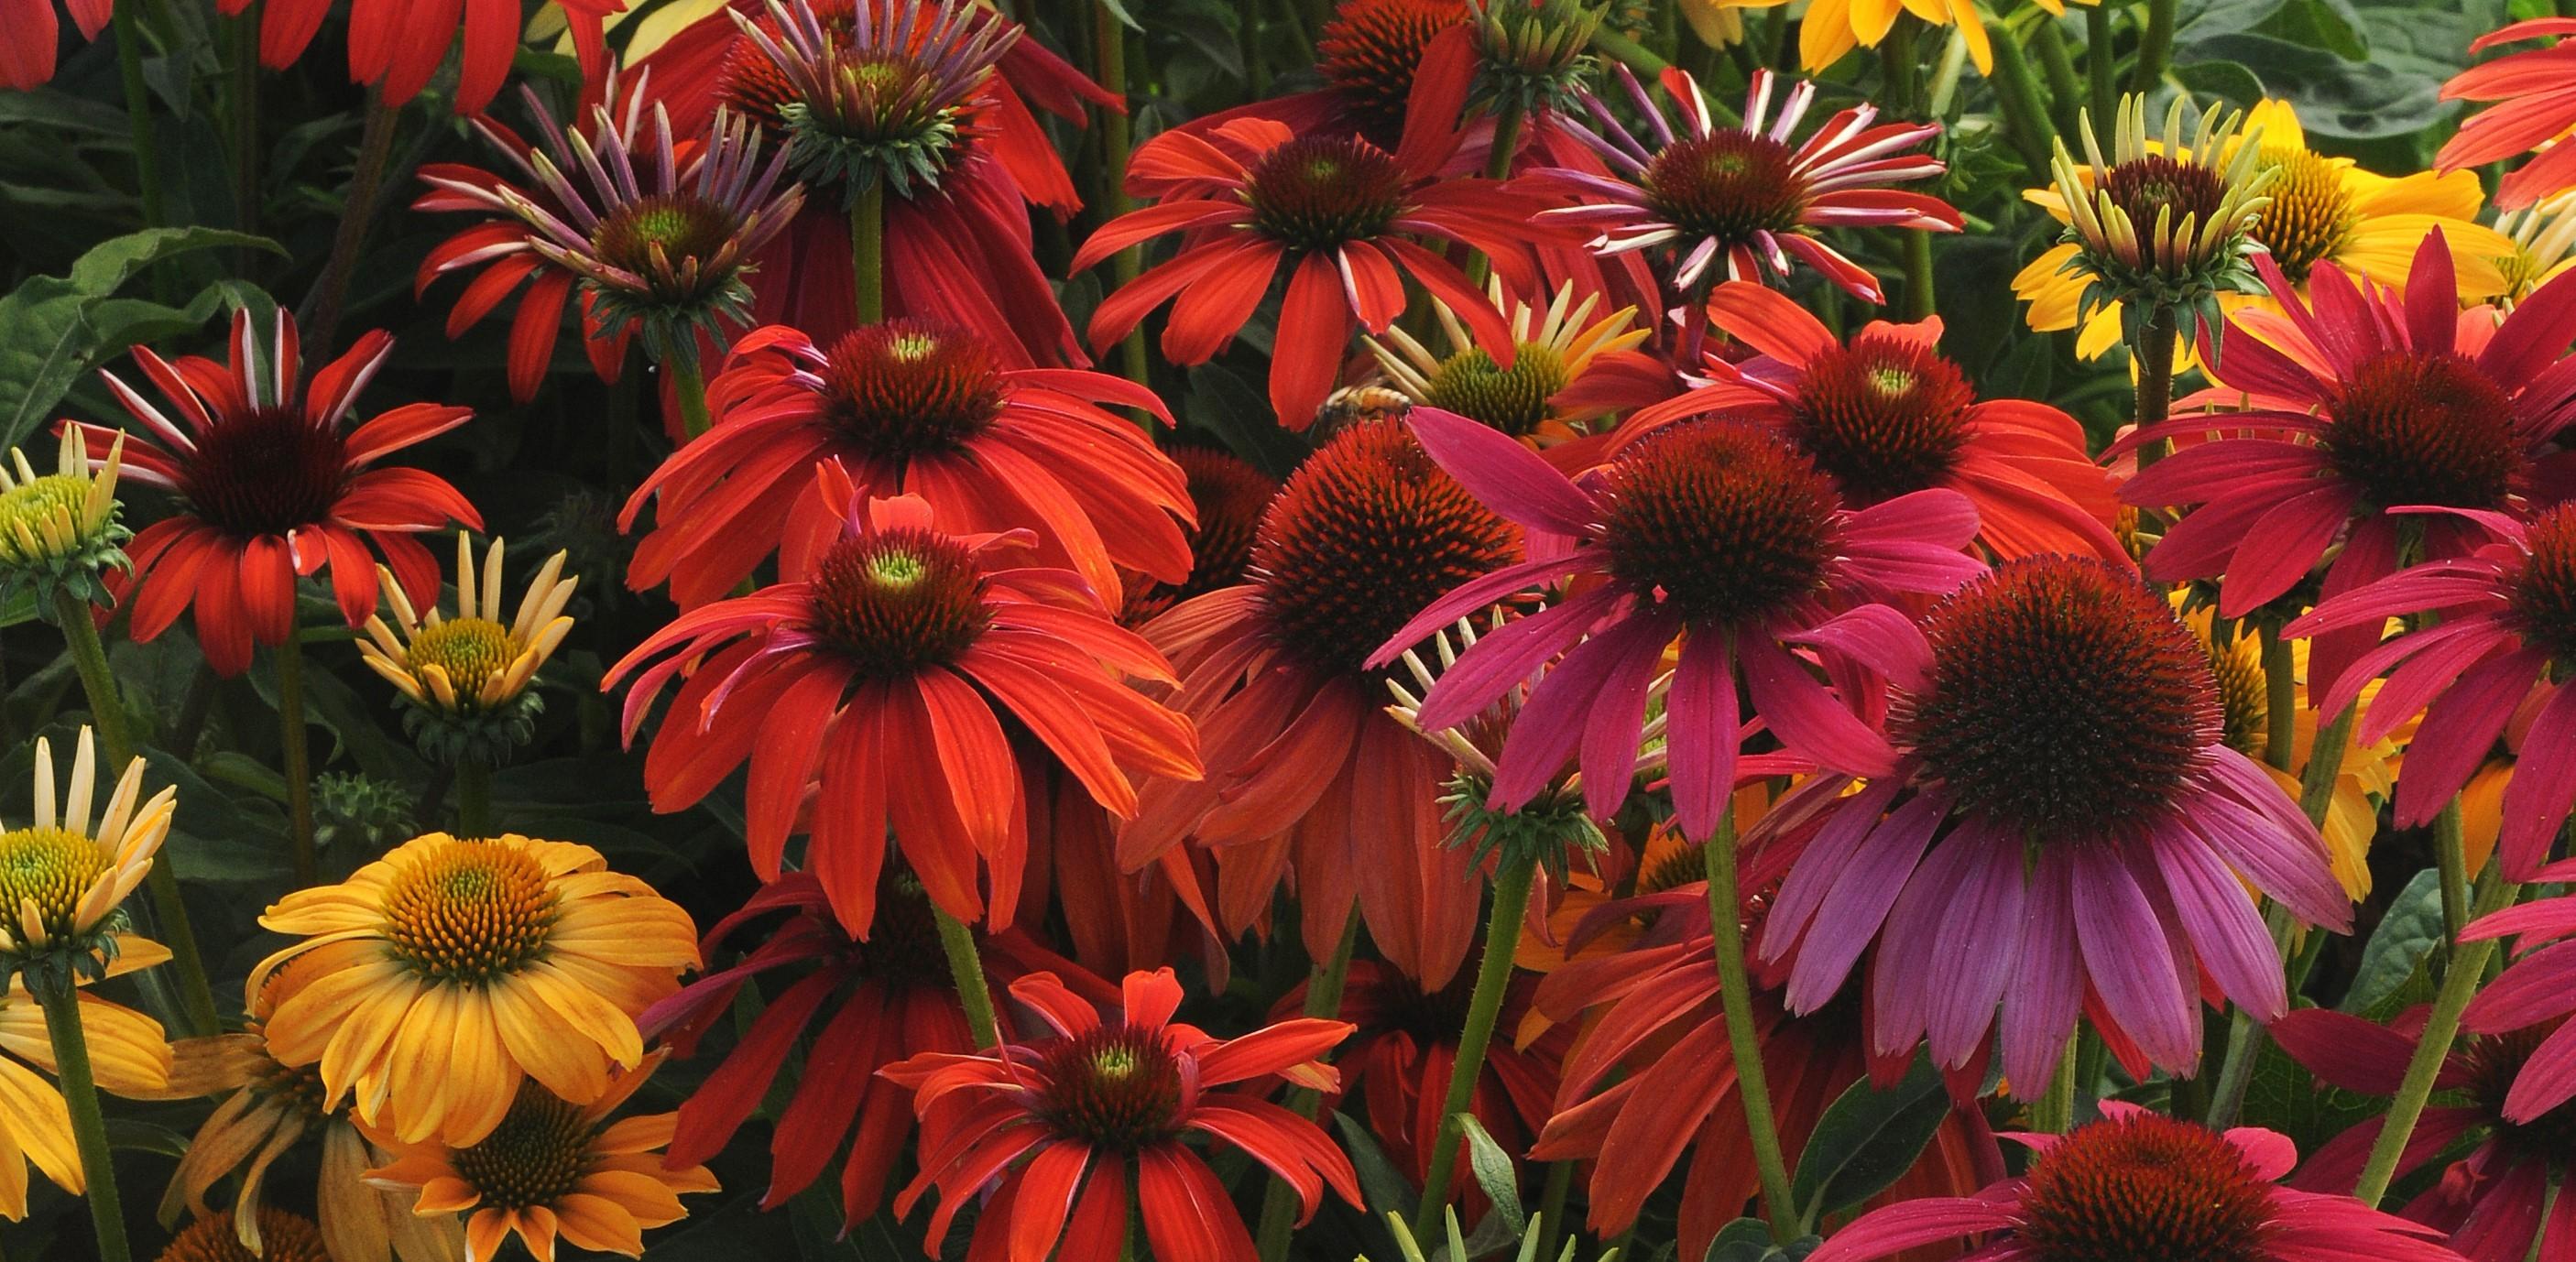 Echinacea Cheyenne Spirit Bloom 3446 USE 2 STAR